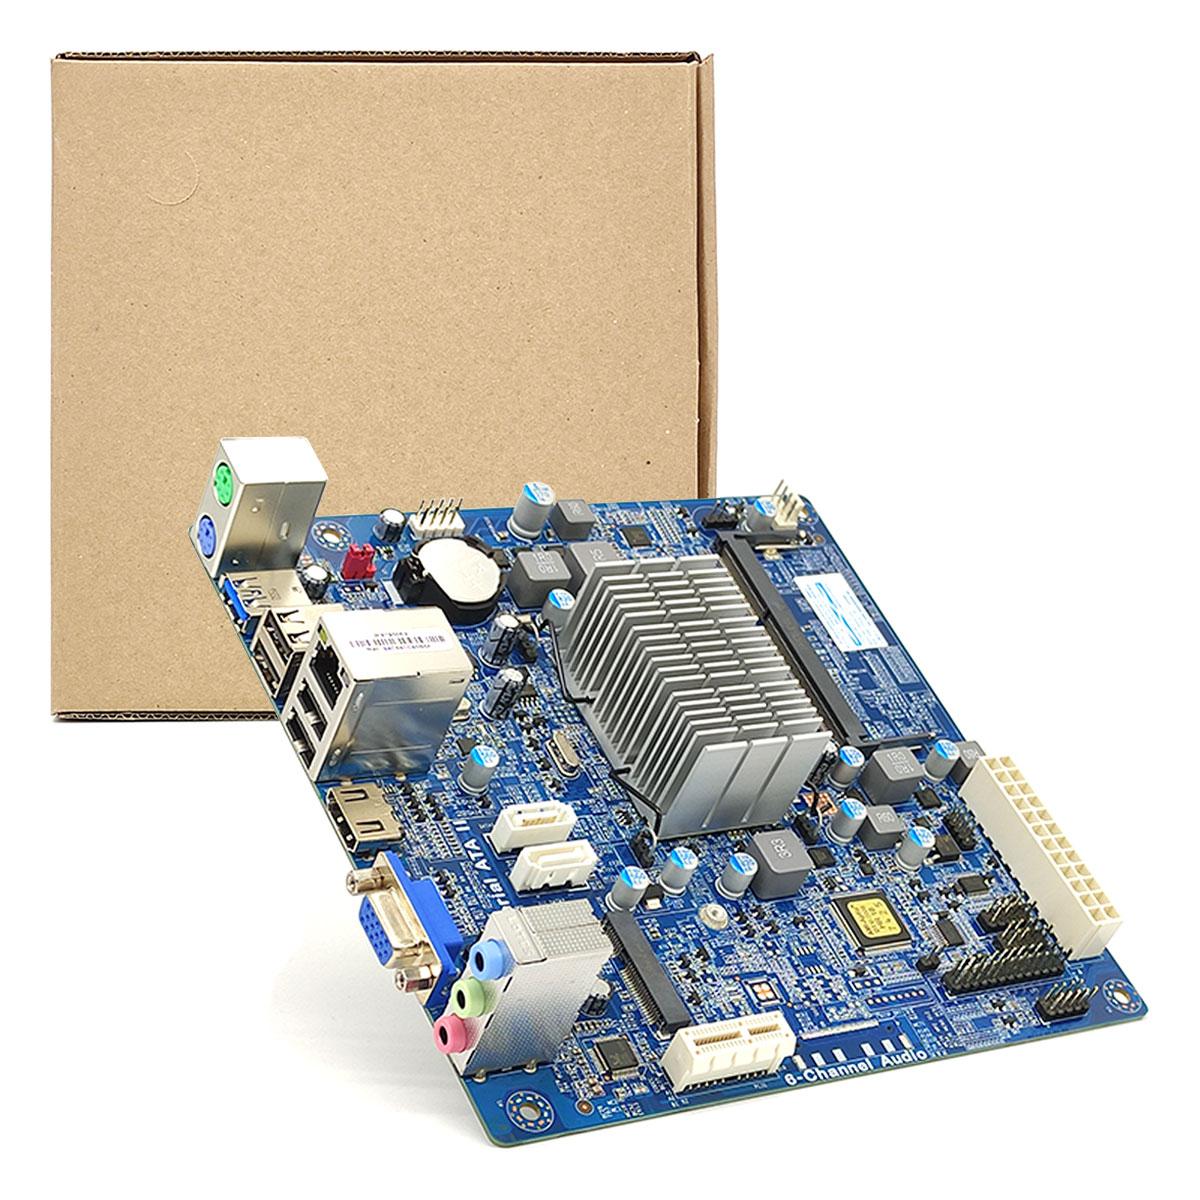 Placa Mãe PCWare IPX1800E2, DDR3/L SO-DIMM, Intel J1800 Integrada, HDMI e m-SATA - OEM